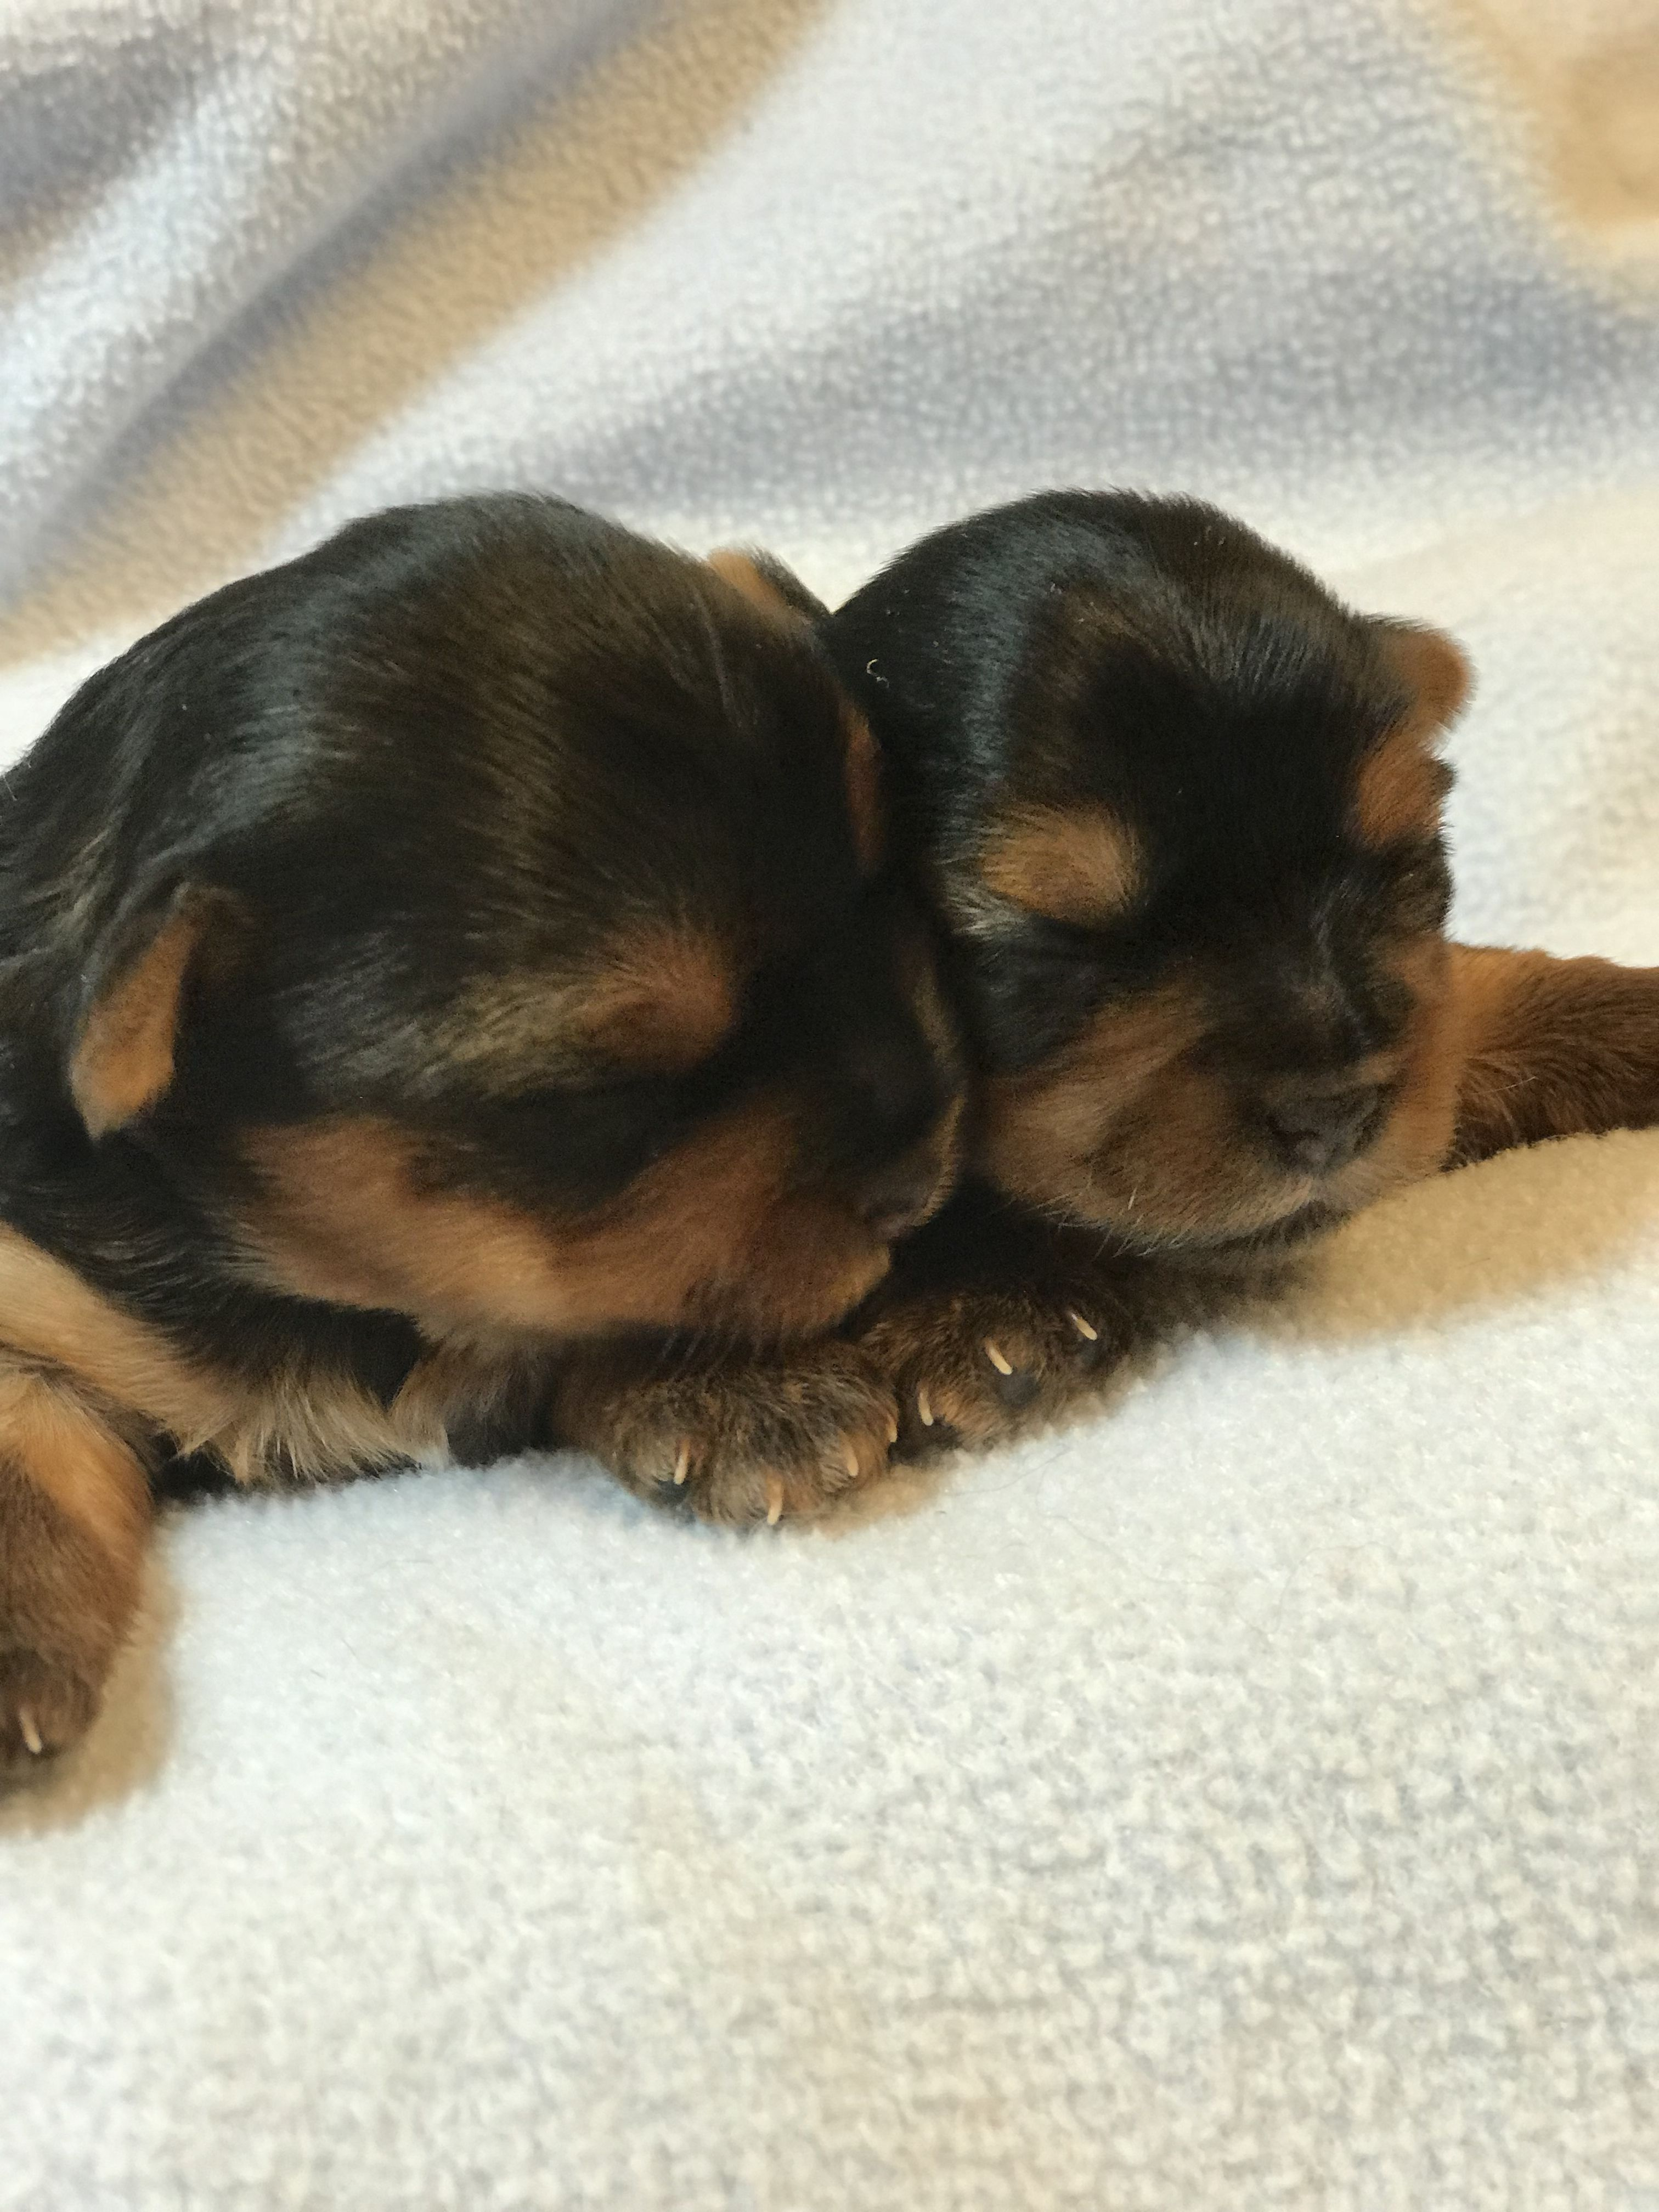 Radford Yorkshire Terriers 540 986 1604 Terrier Breeds Teacup Puppies Dogs